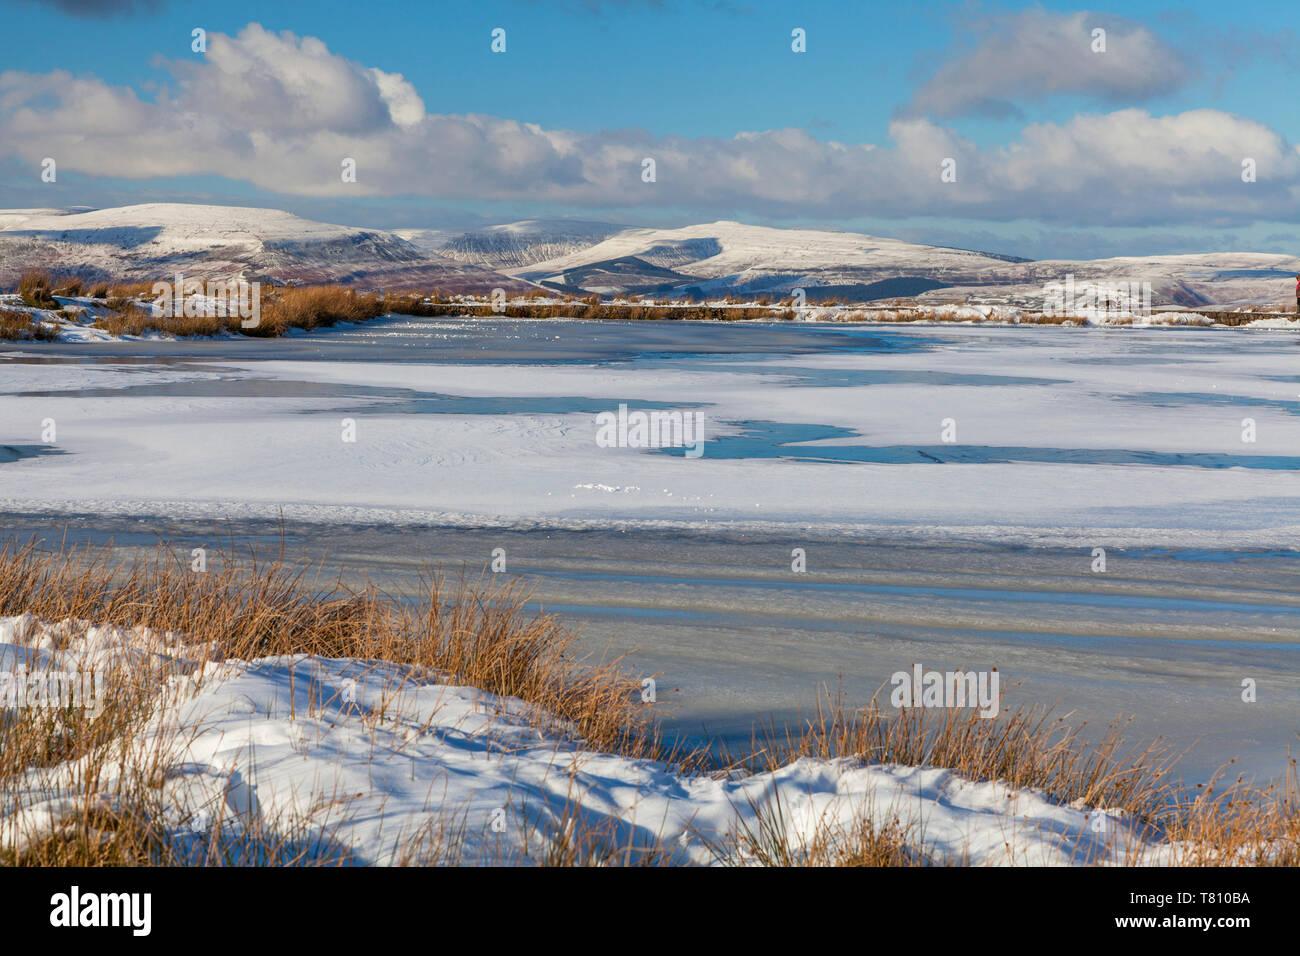 Tierpfleger Teich, Blaenavon, Brecon Beacons, South Wales, Großbritannien, Europa Stockfoto